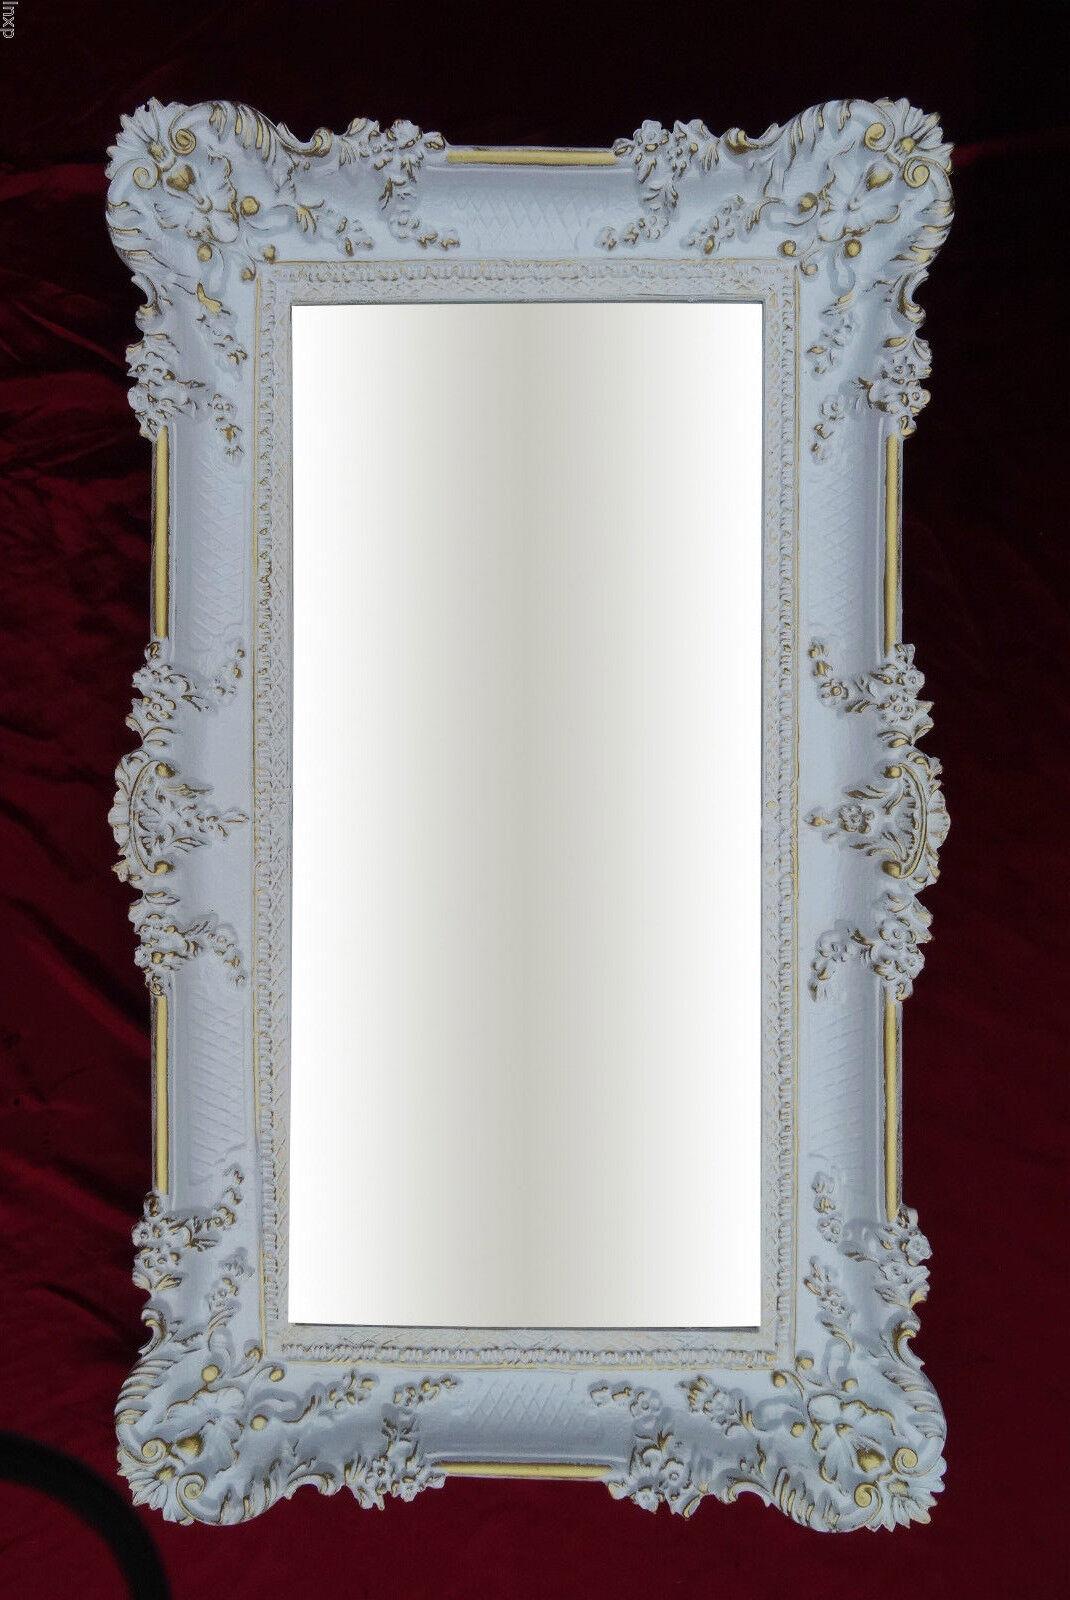 wandspiegel wei gold 96x57 antik barock shabby chic. Black Bedroom Furniture Sets. Home Design Ideas